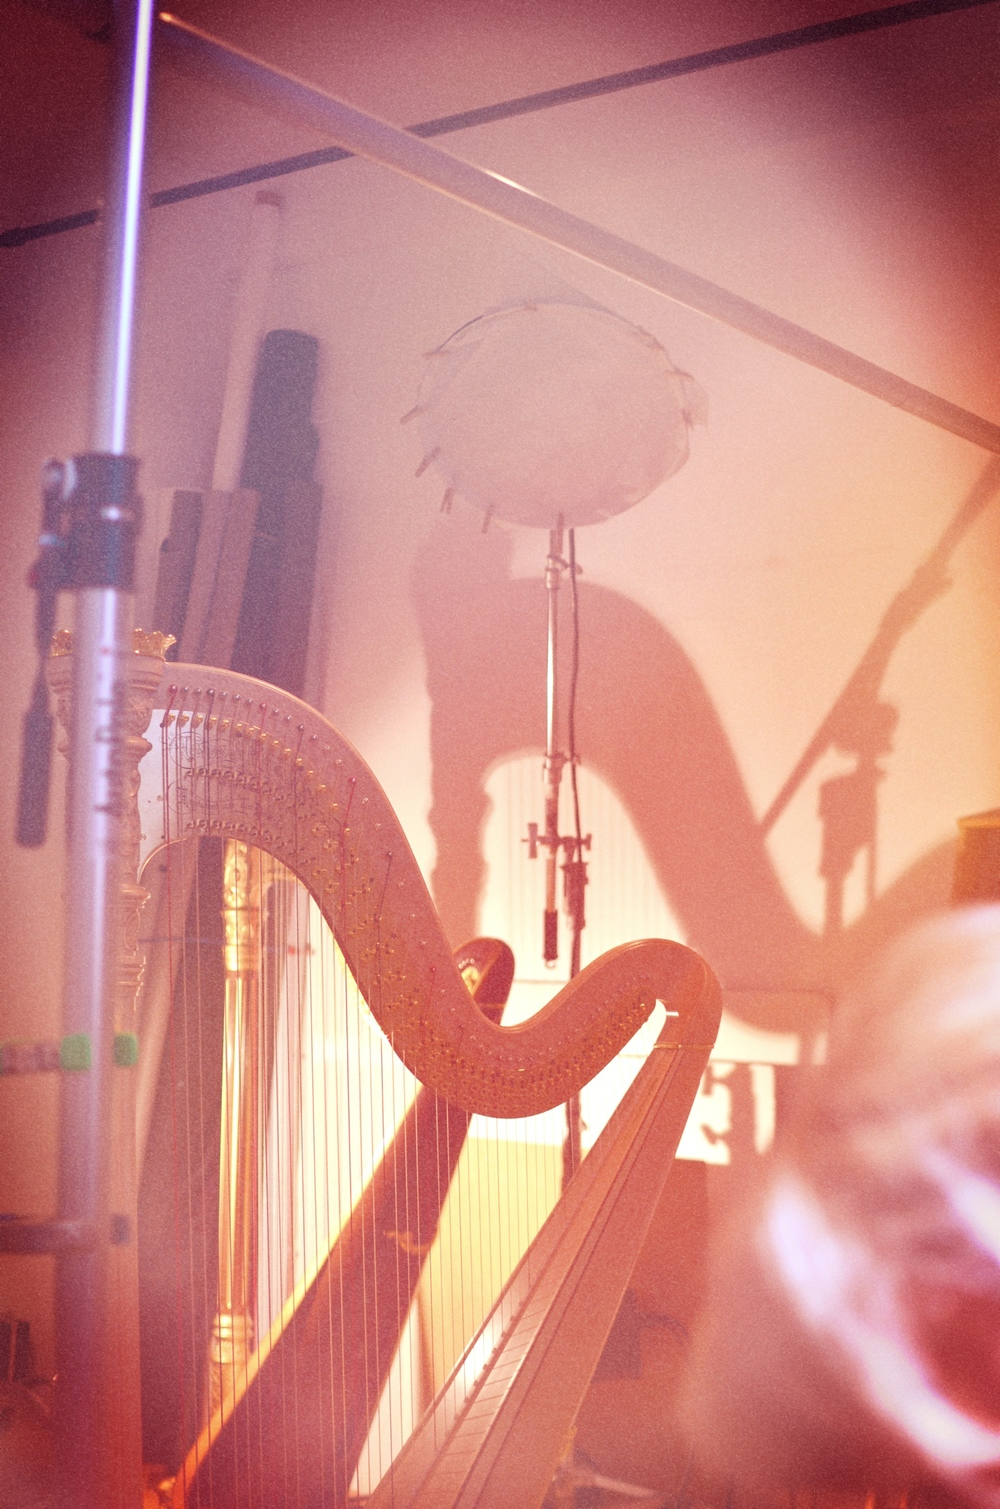 Photoshoot - Harps Vertical.jpg